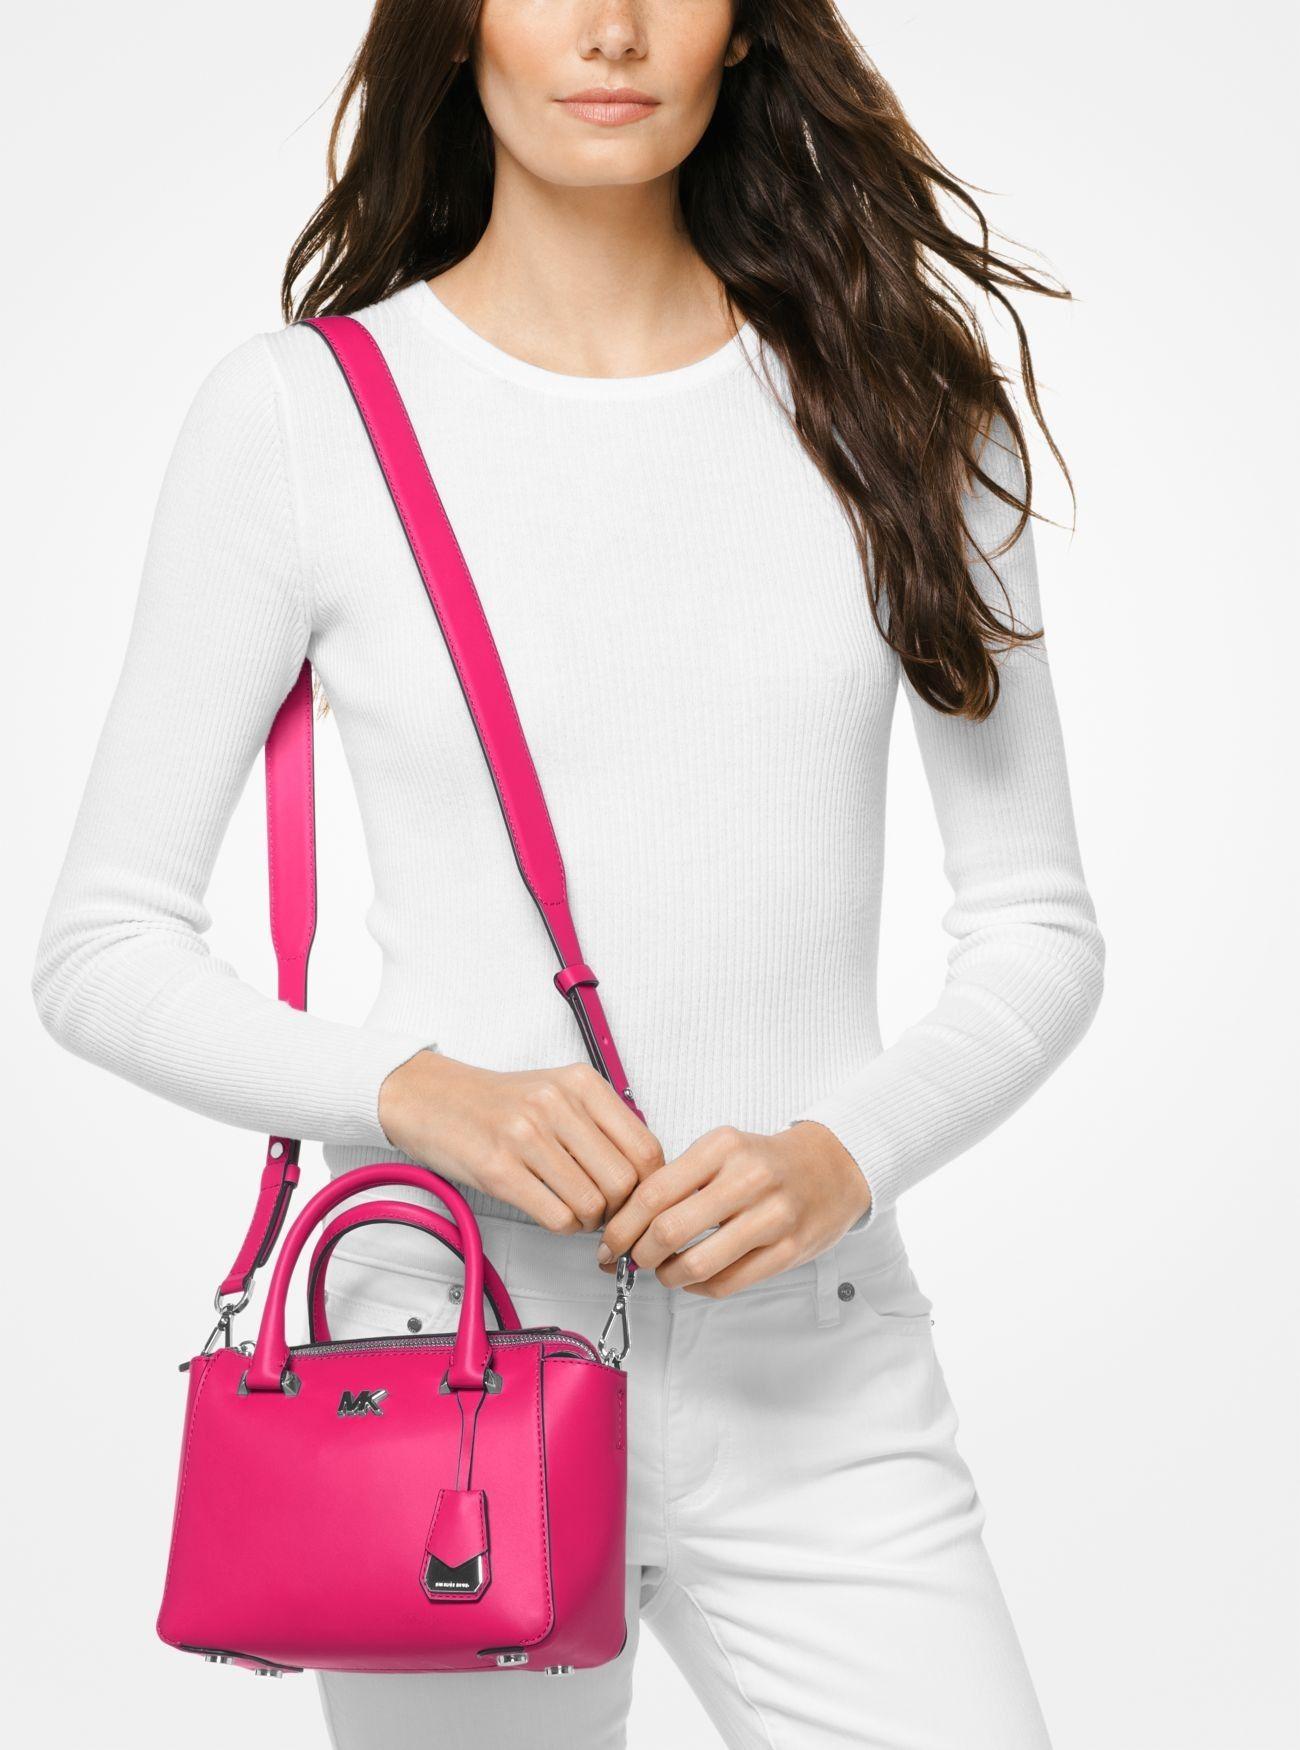 a8816686f53a Online Michael Kors Ultra Pink Nolita Mini Leather Satchel Outlet Sale